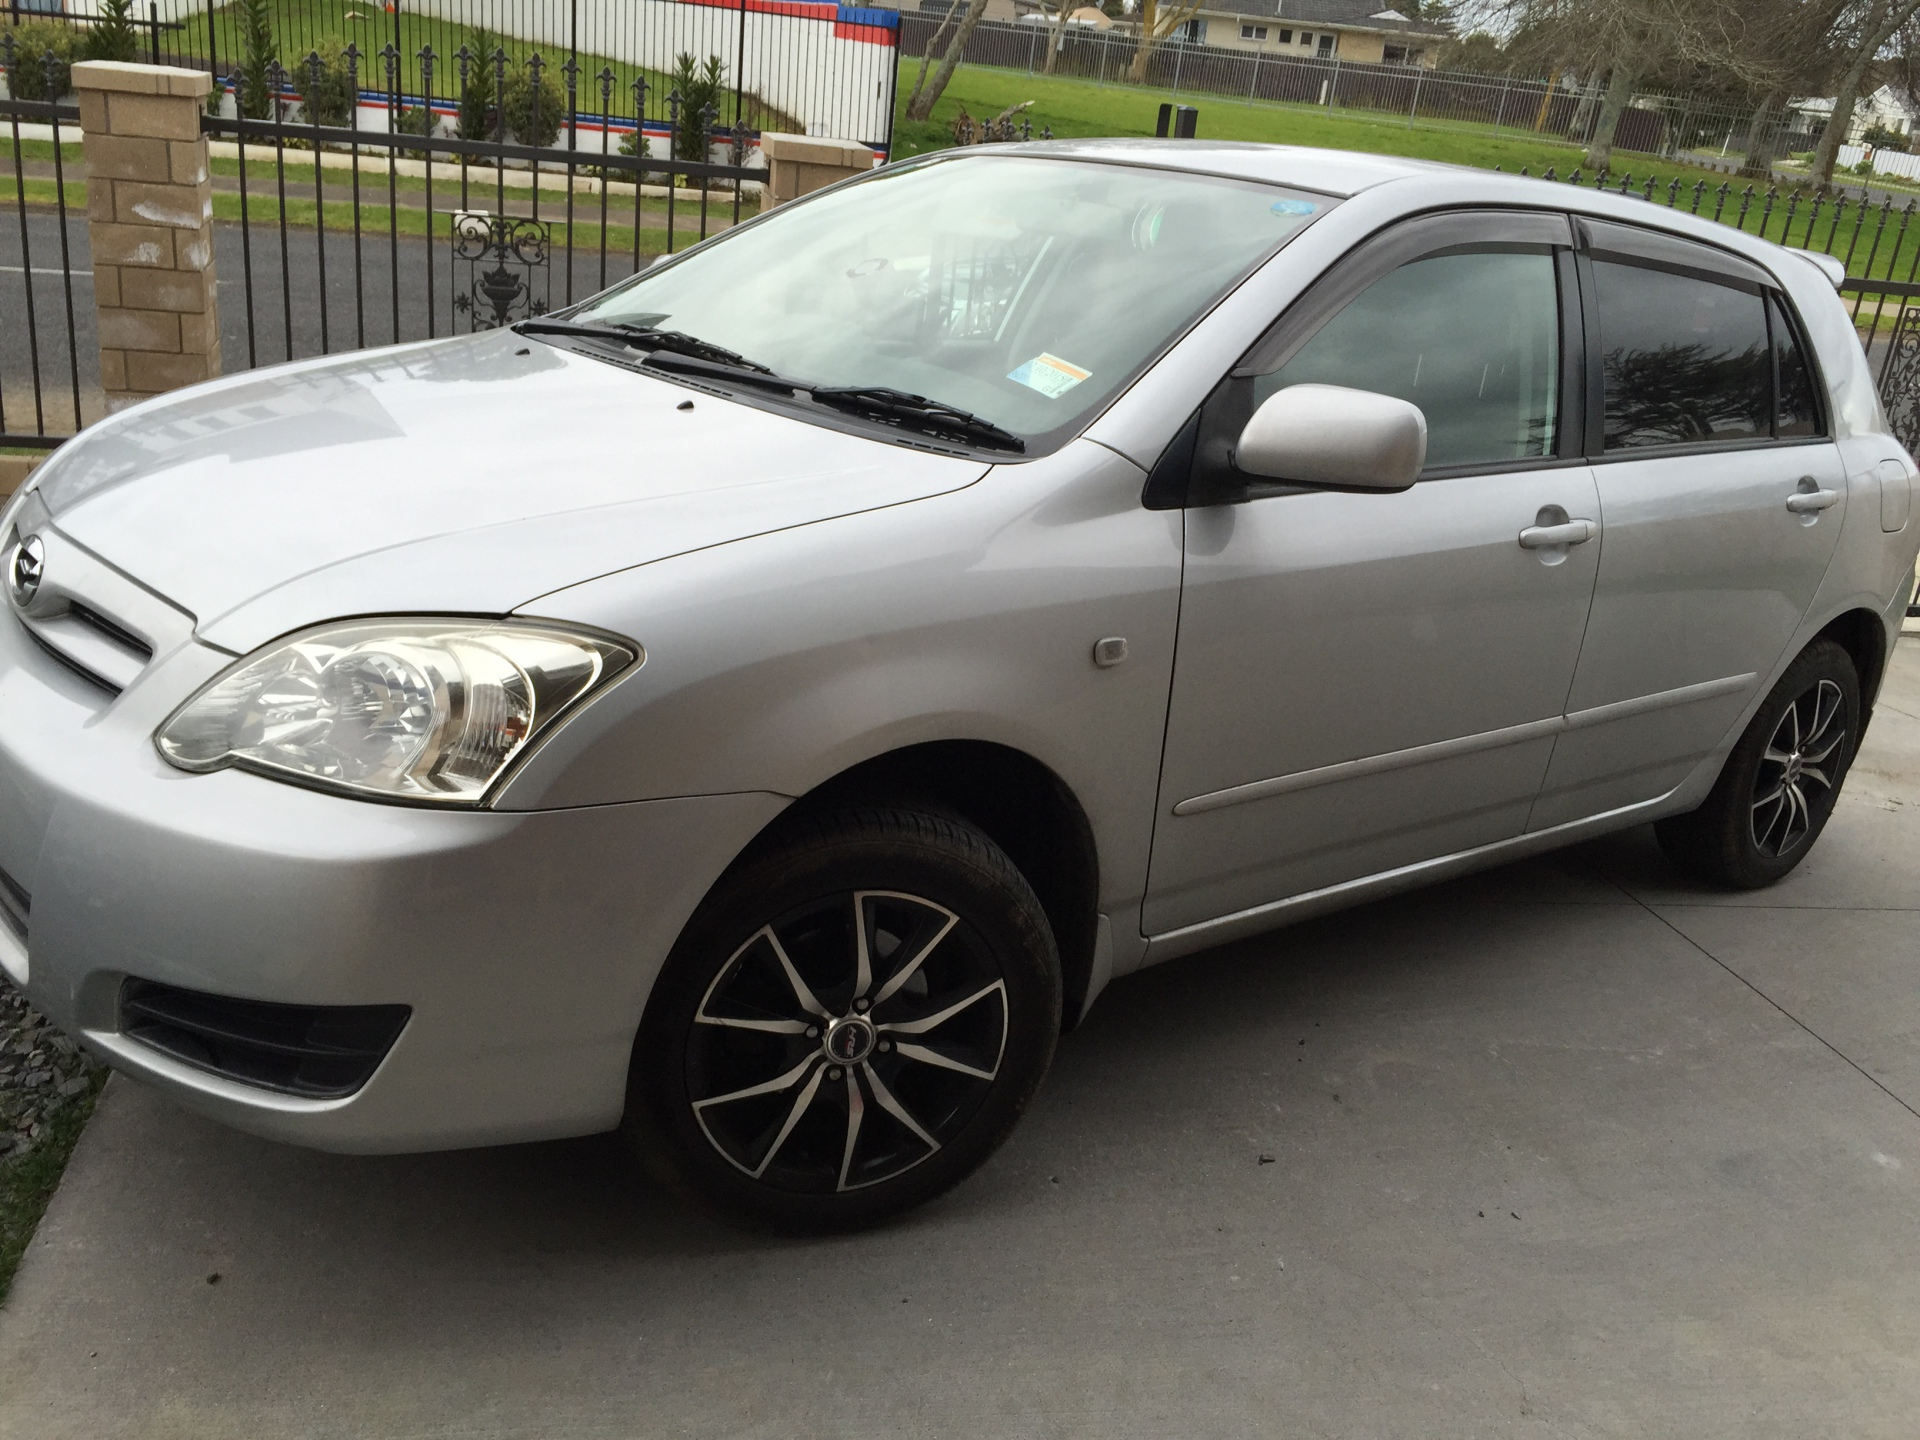 2005 Toyota Runx $6,800